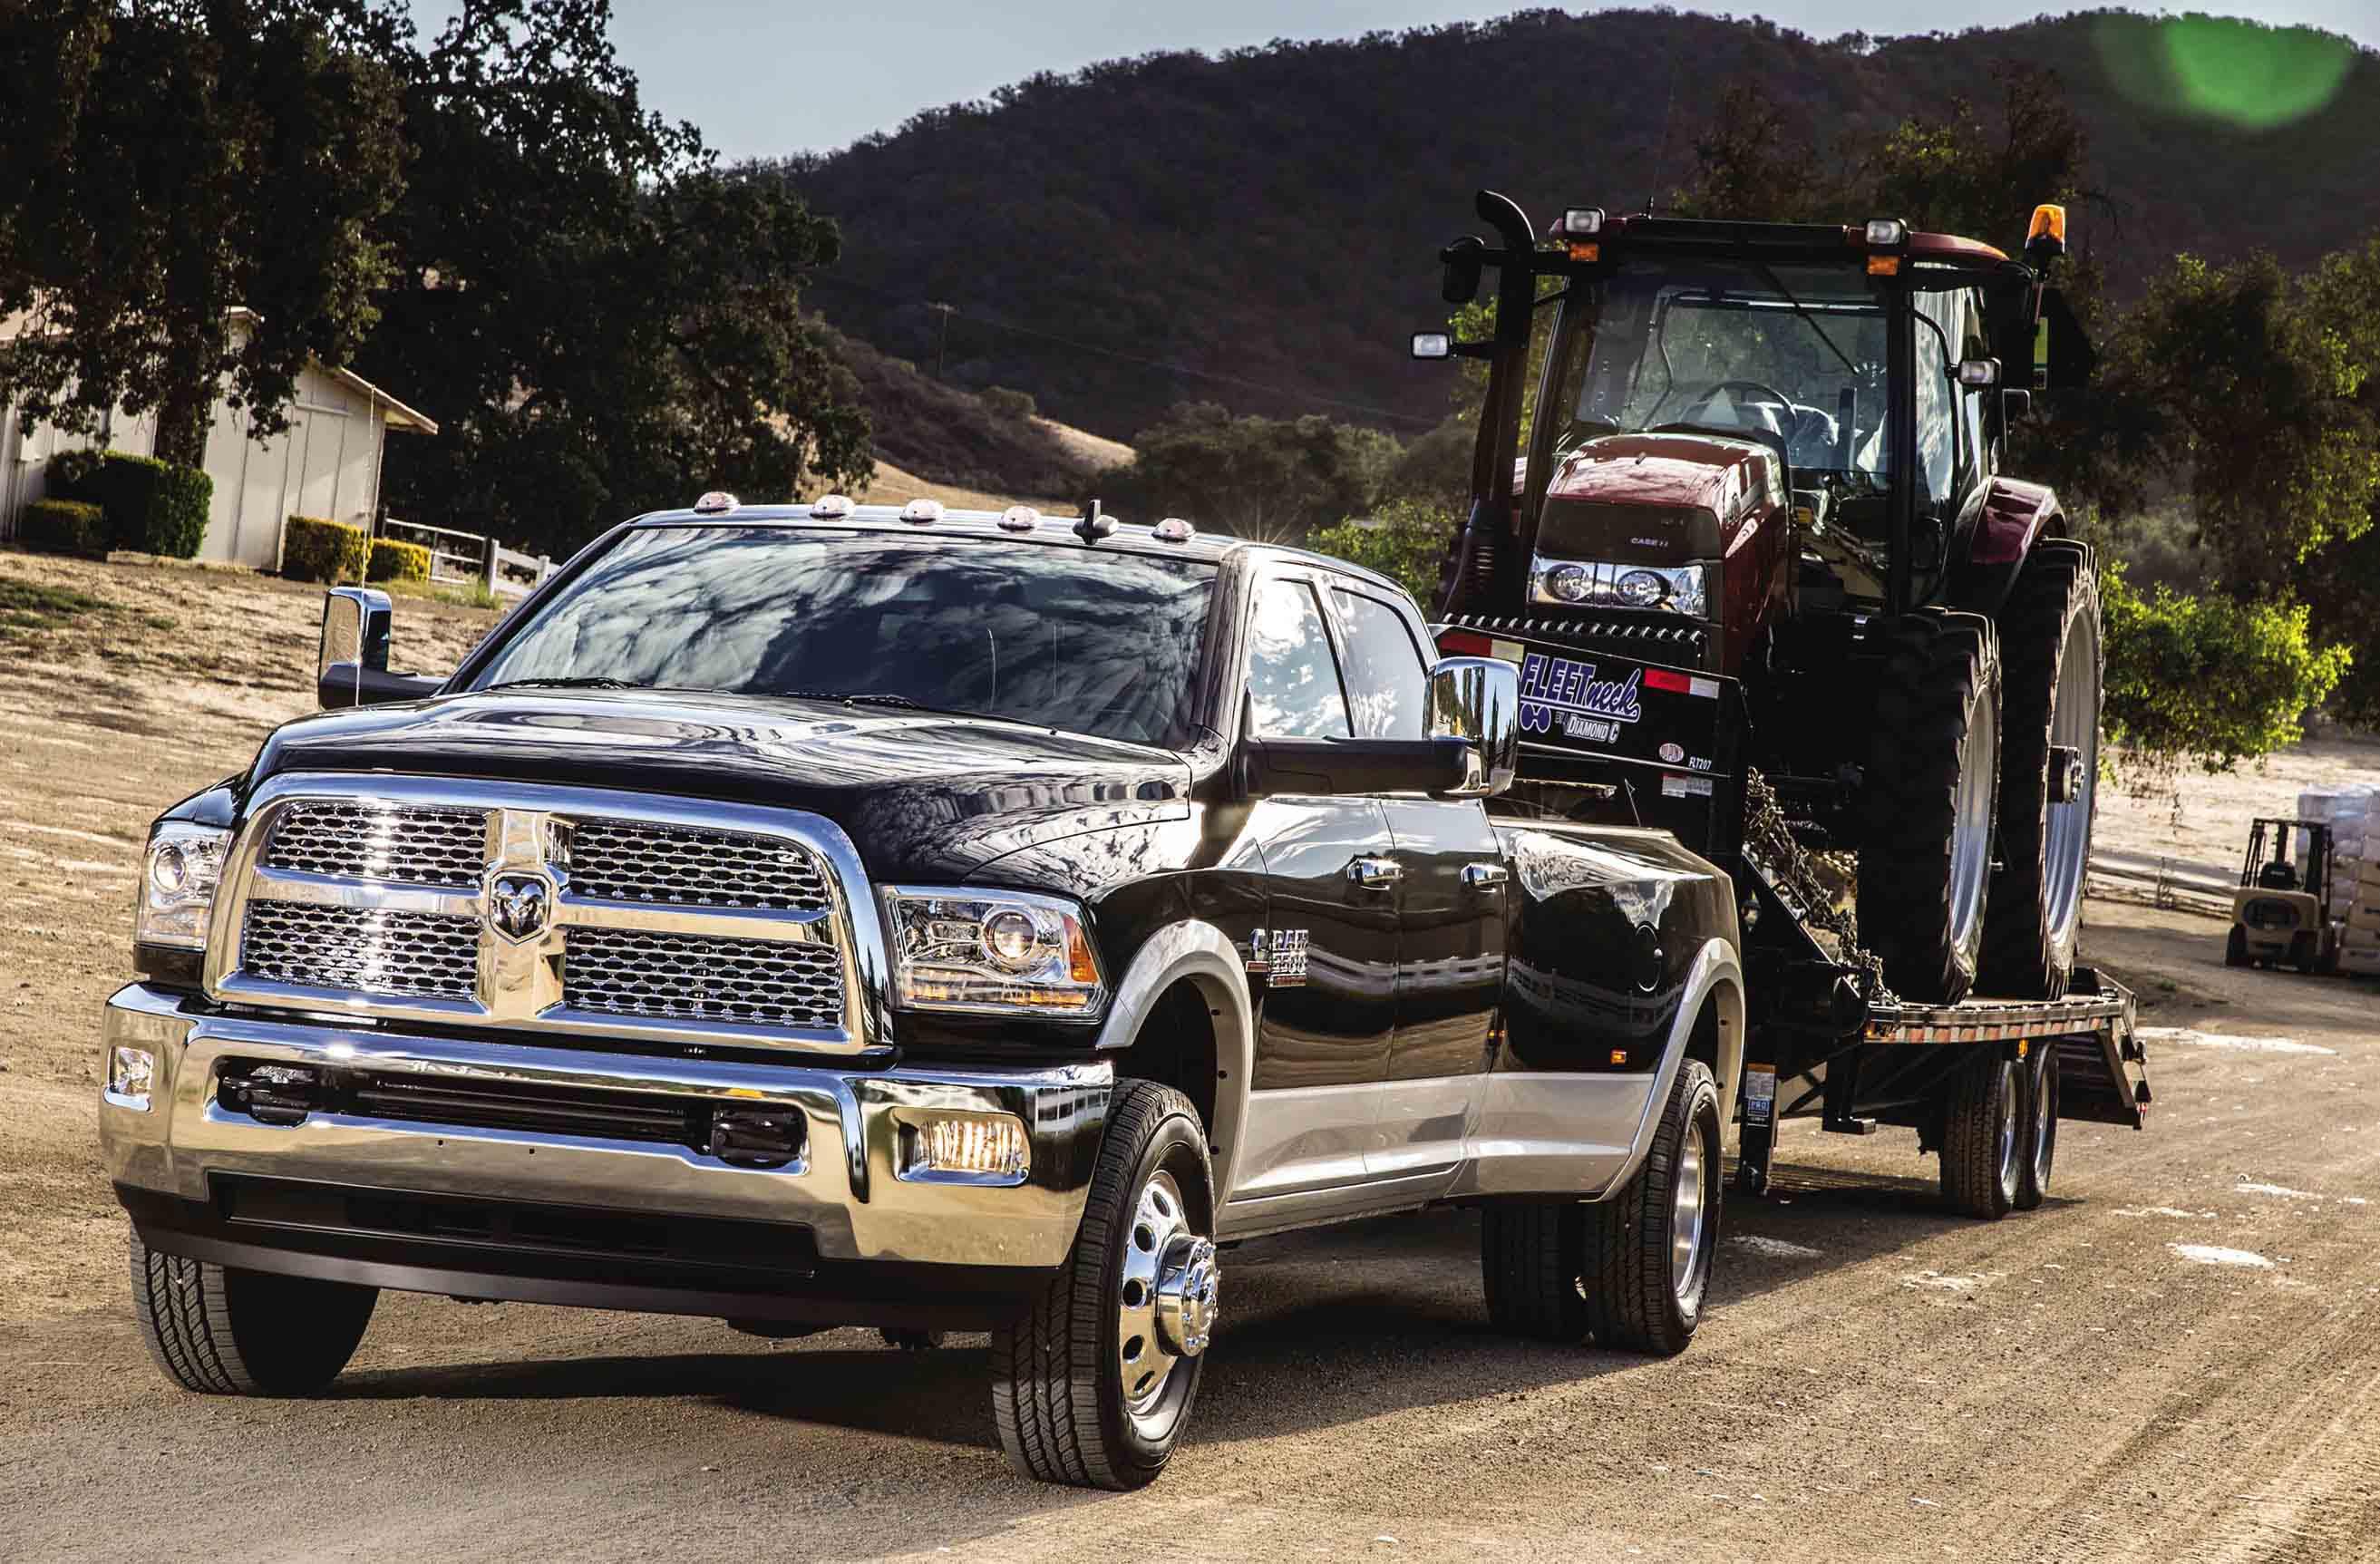 ram trucks in louisville oxmoor chrysler dodge jeep ram. Black Bedroom Furniture Sets. Home Design Ideas